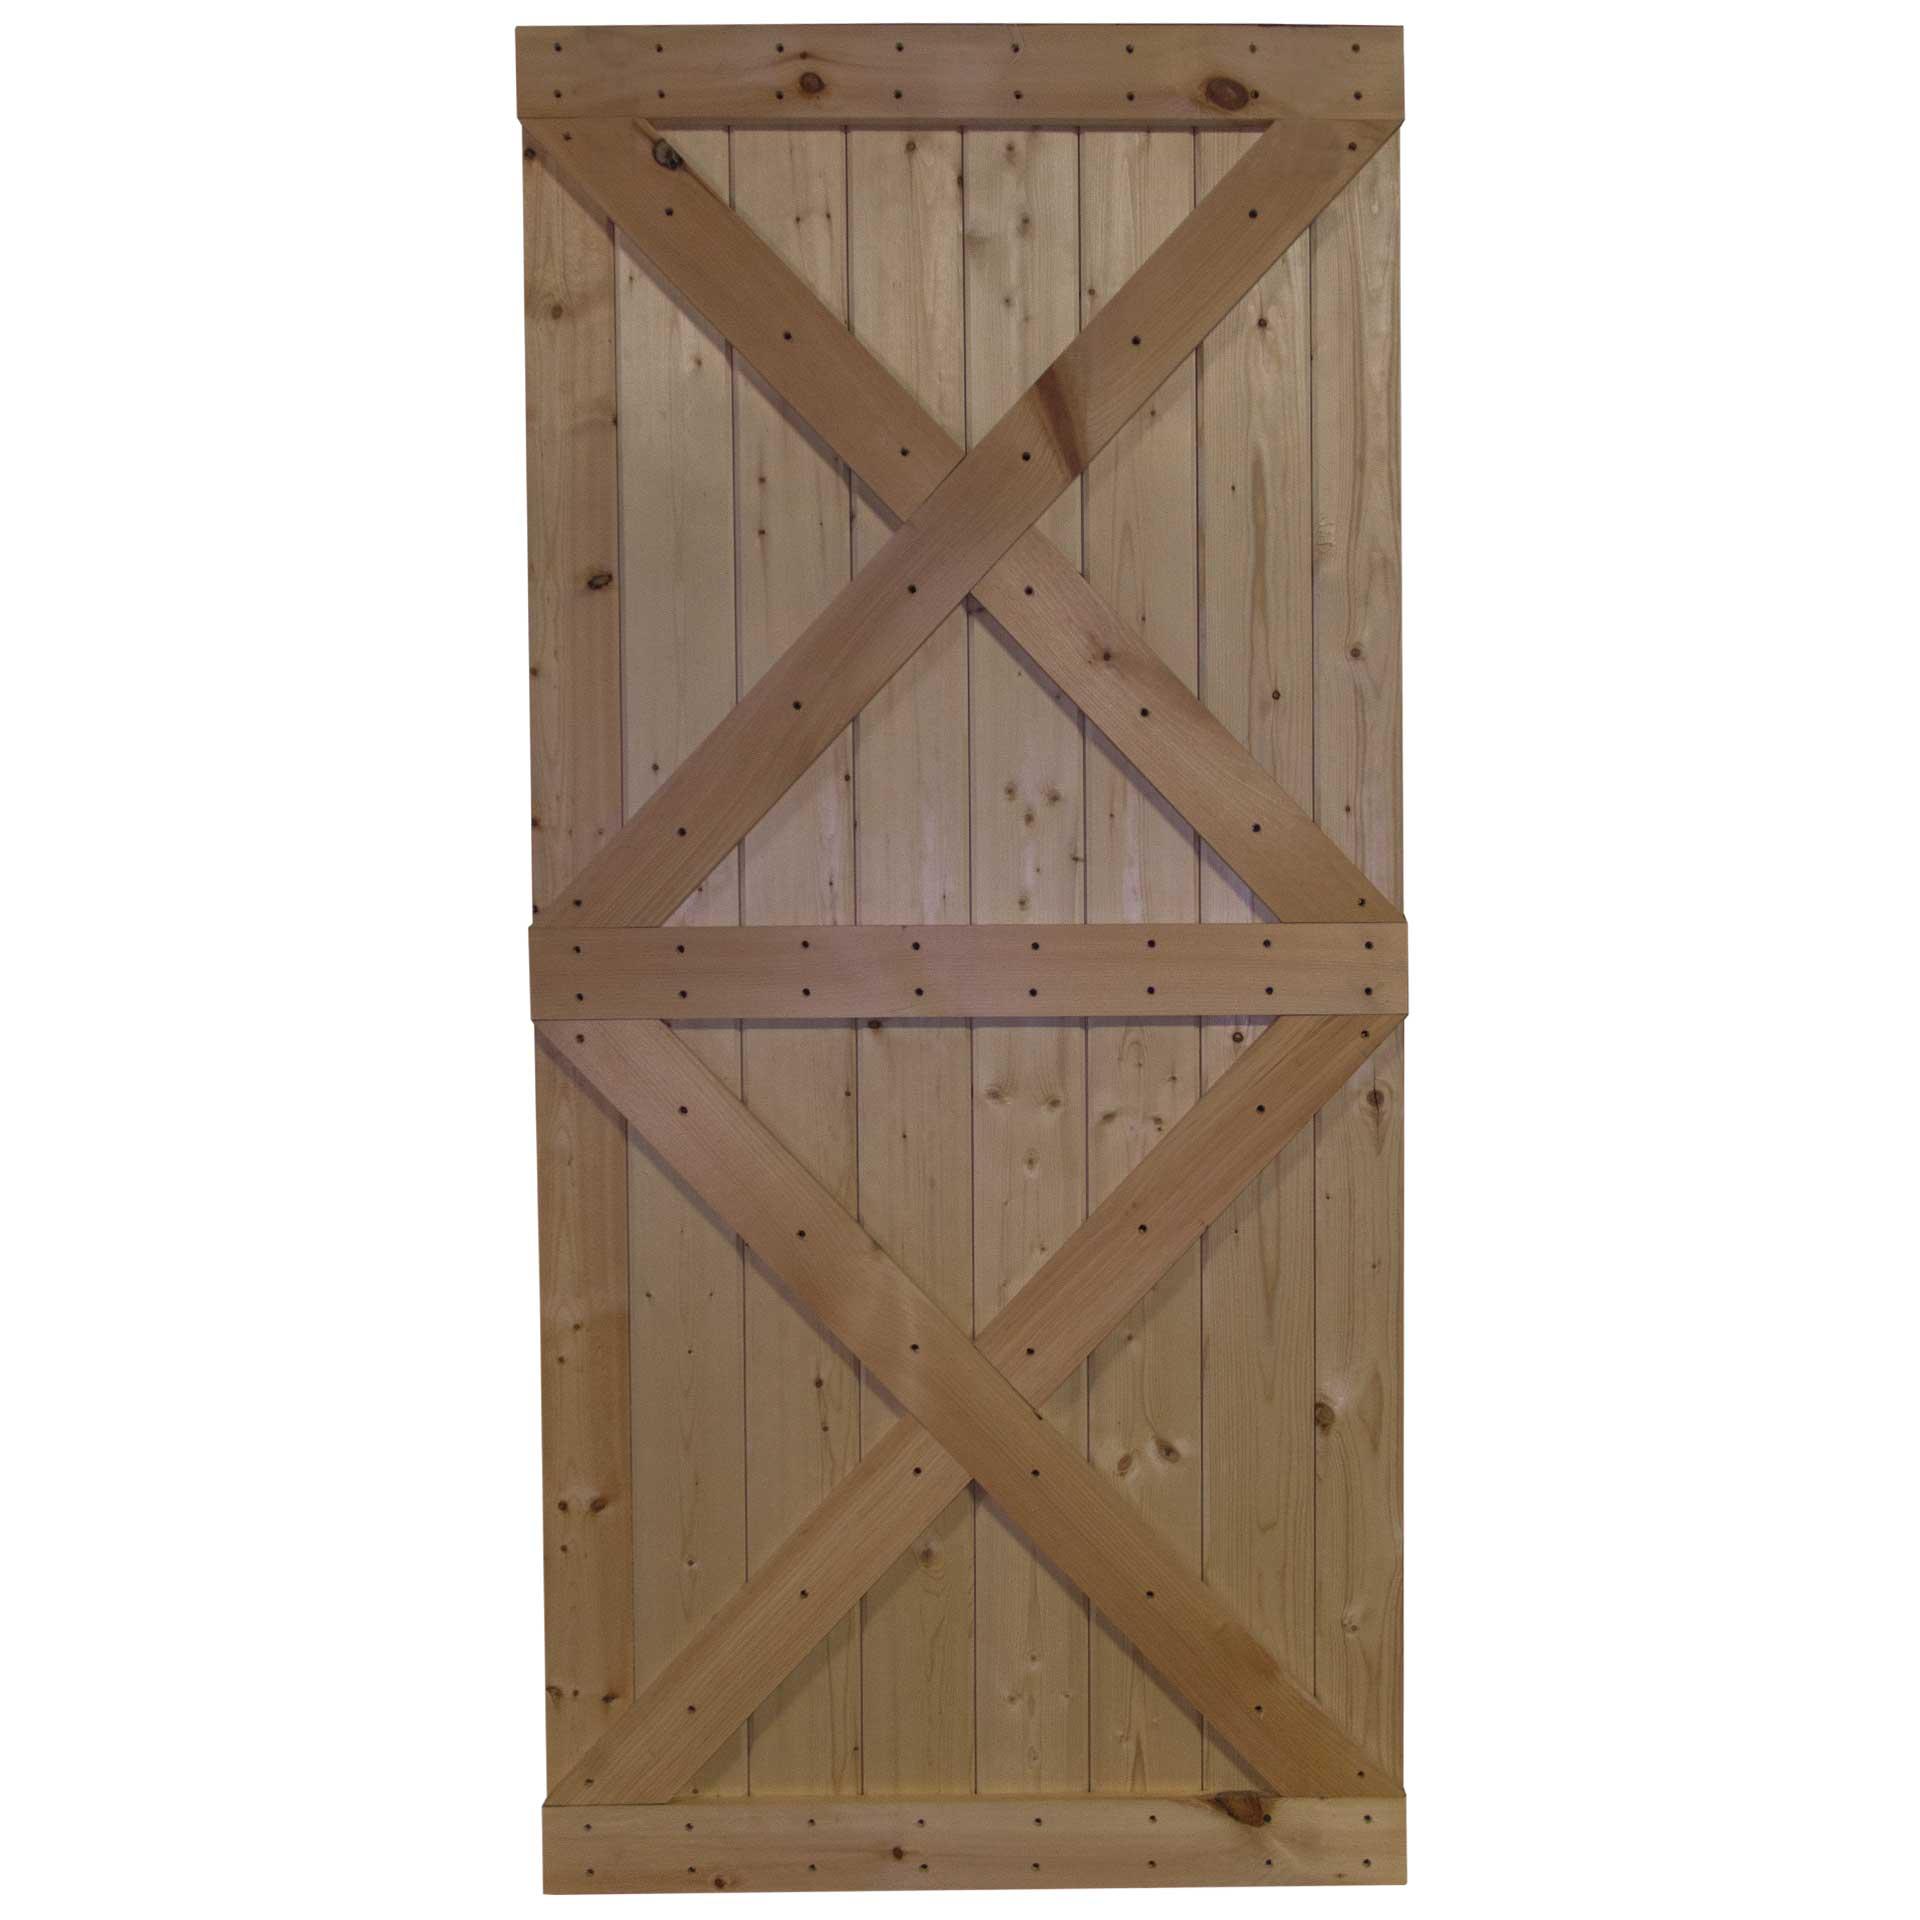 barn product vintage dsc door plank special brown barns pine lumber wide